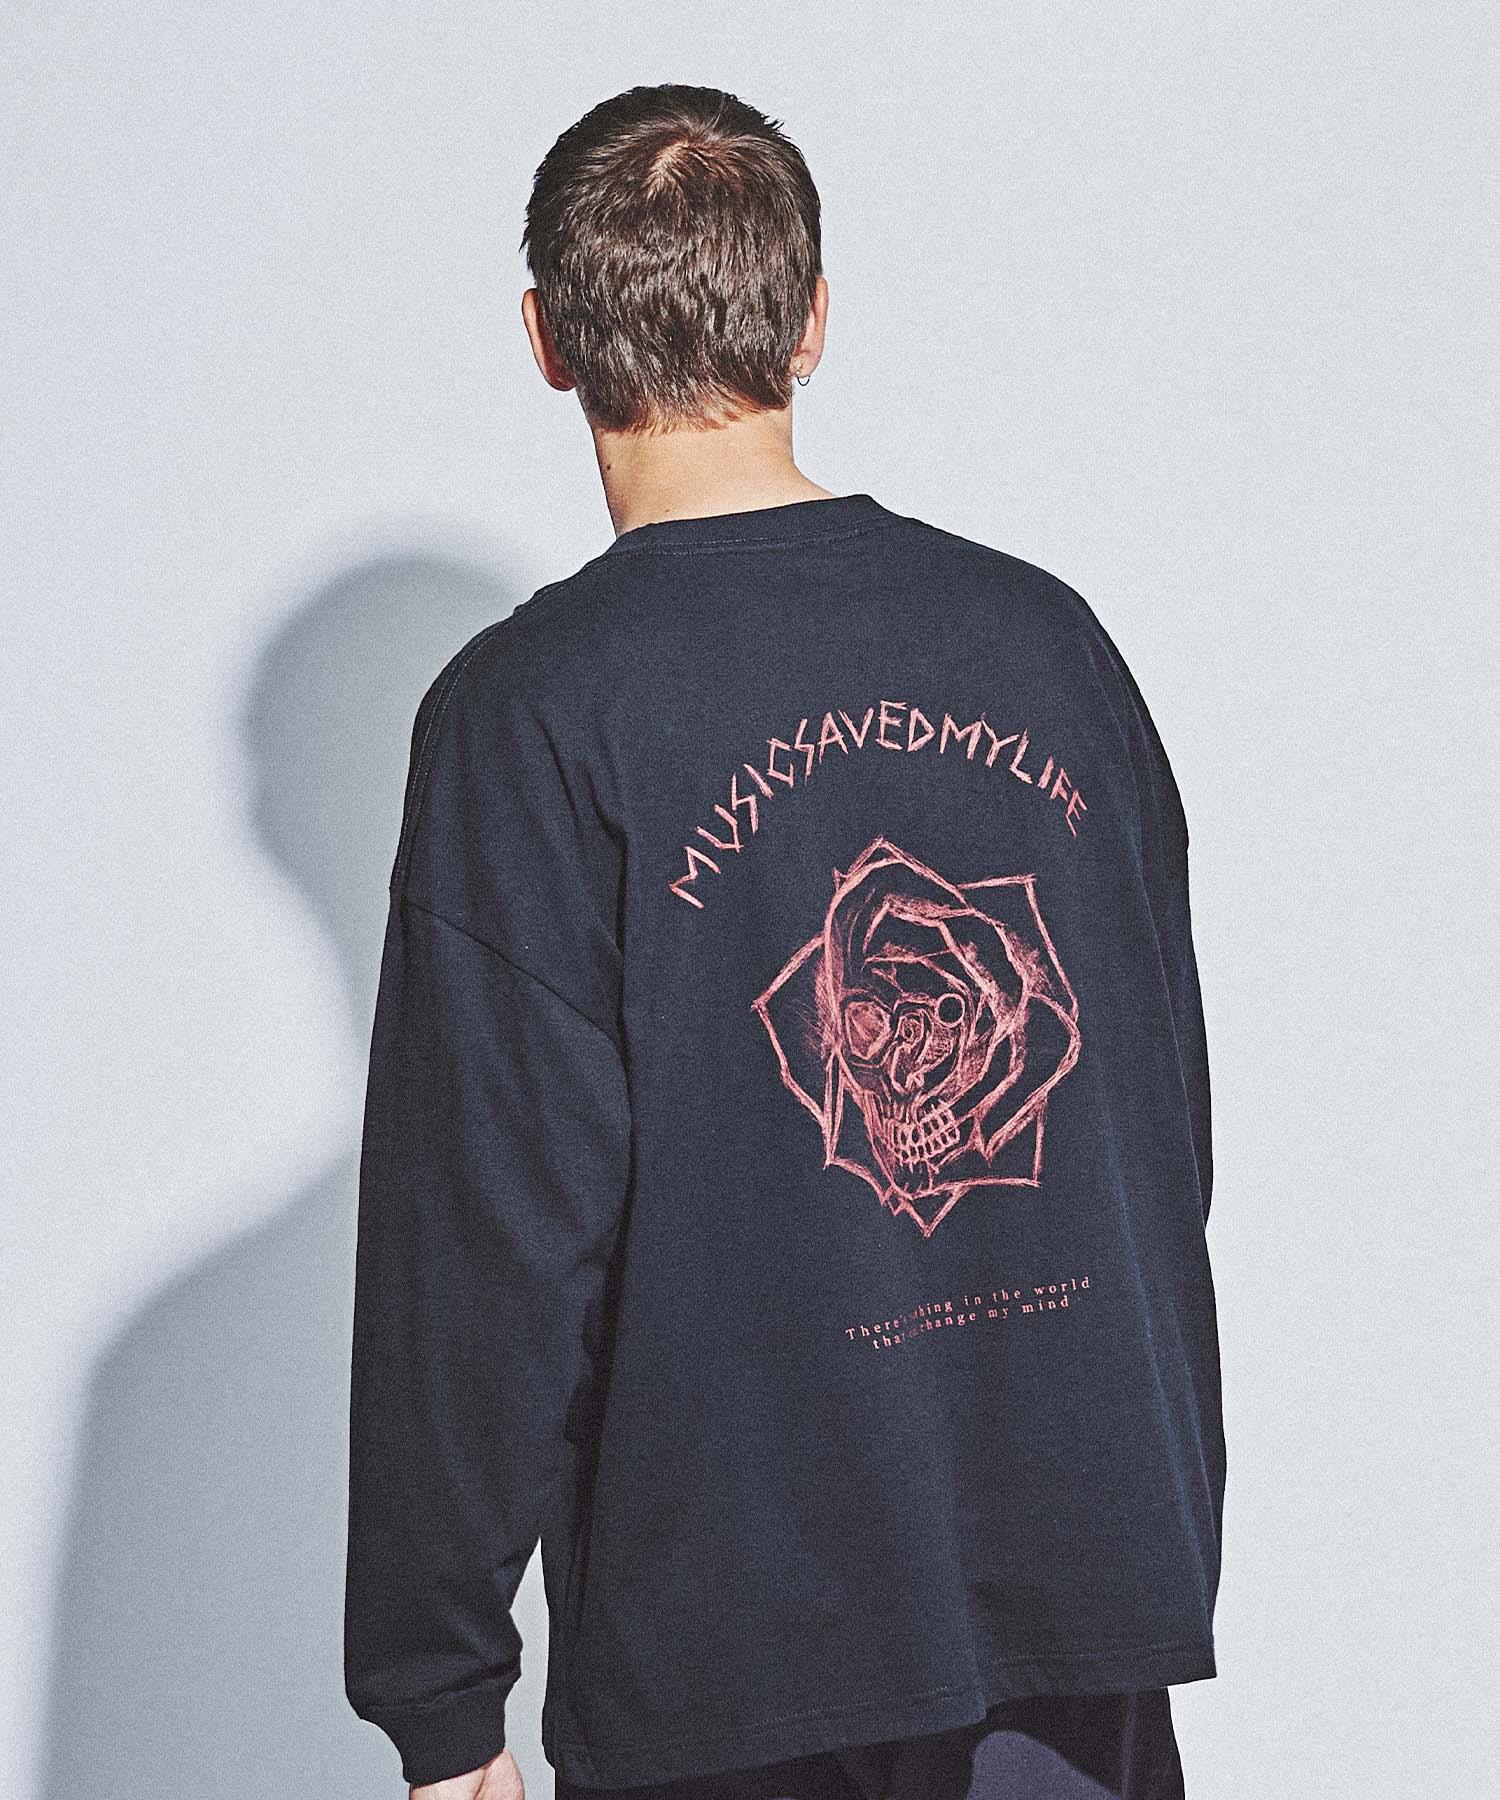 【MSML(エムエスエムエル)】ROSE&SKULL OVERSIZED LONG SLEEVE TEE Tシャツ(M21-02L5-TL01)